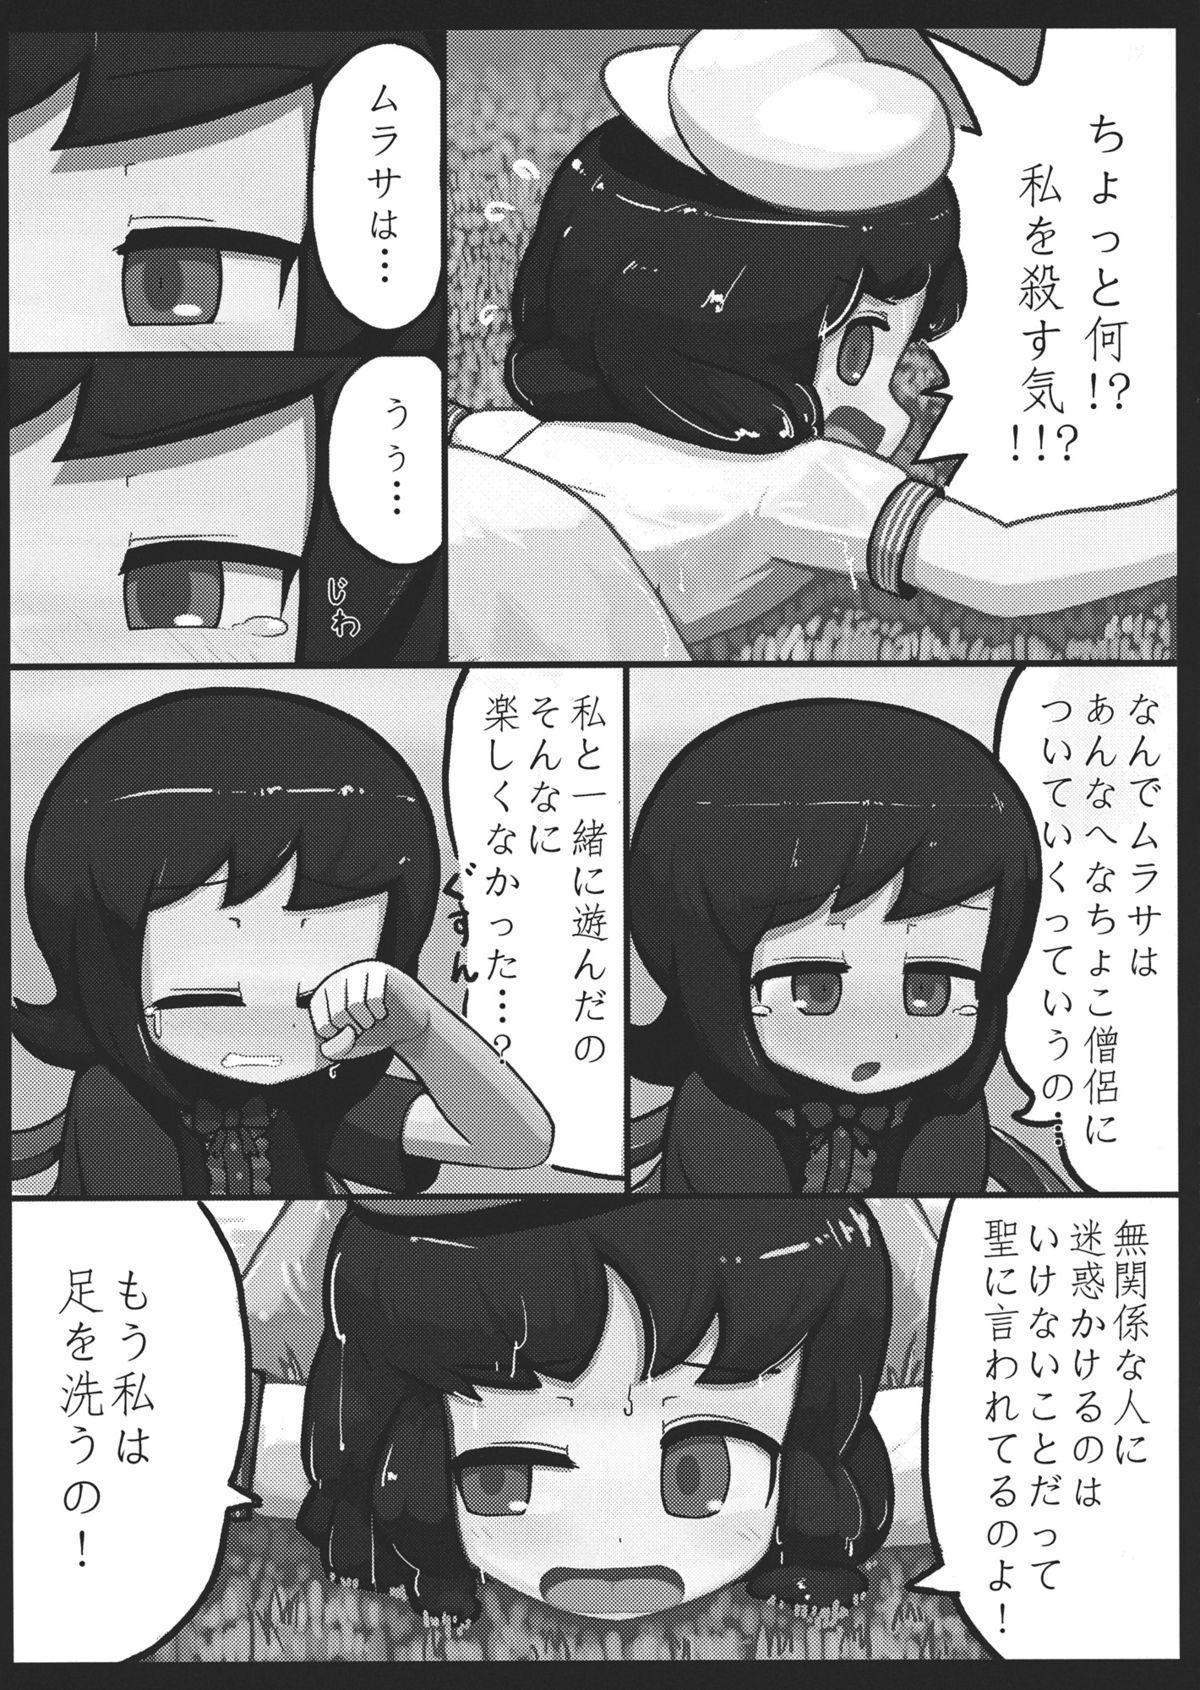 Nue x Murasa Shunga 8